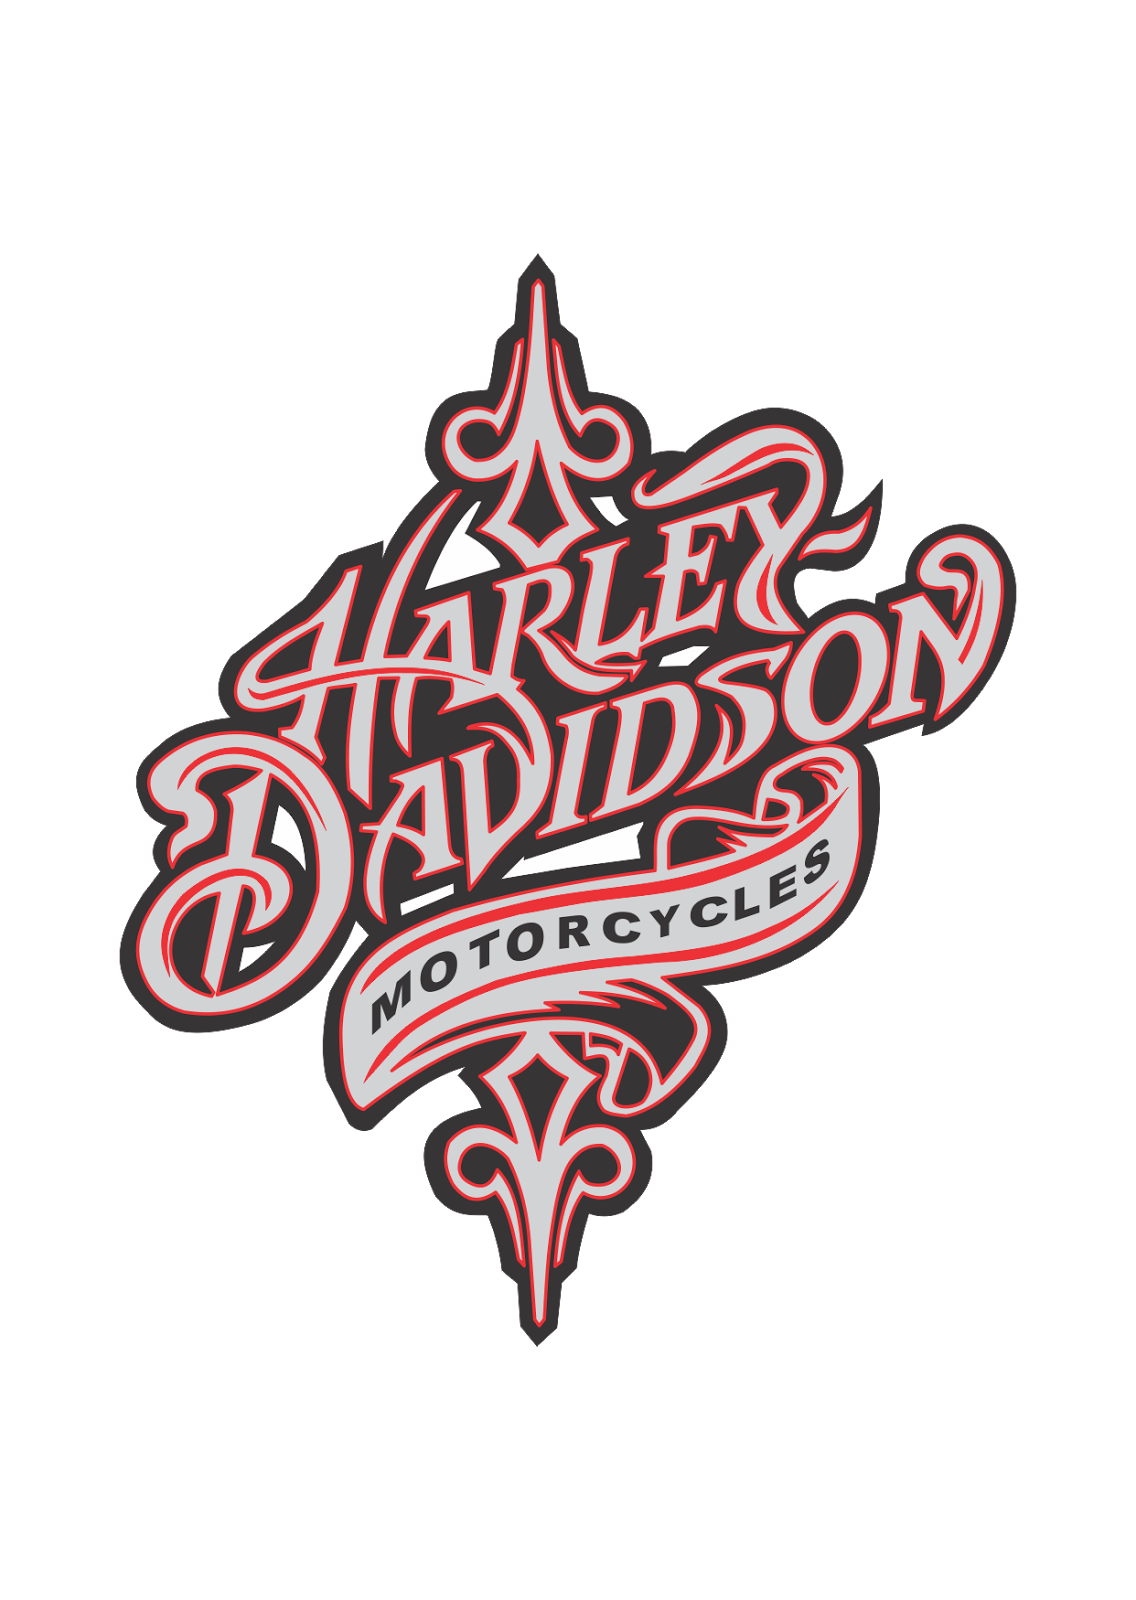 Harley davidson motorcycles Logo Vector Harley davidson